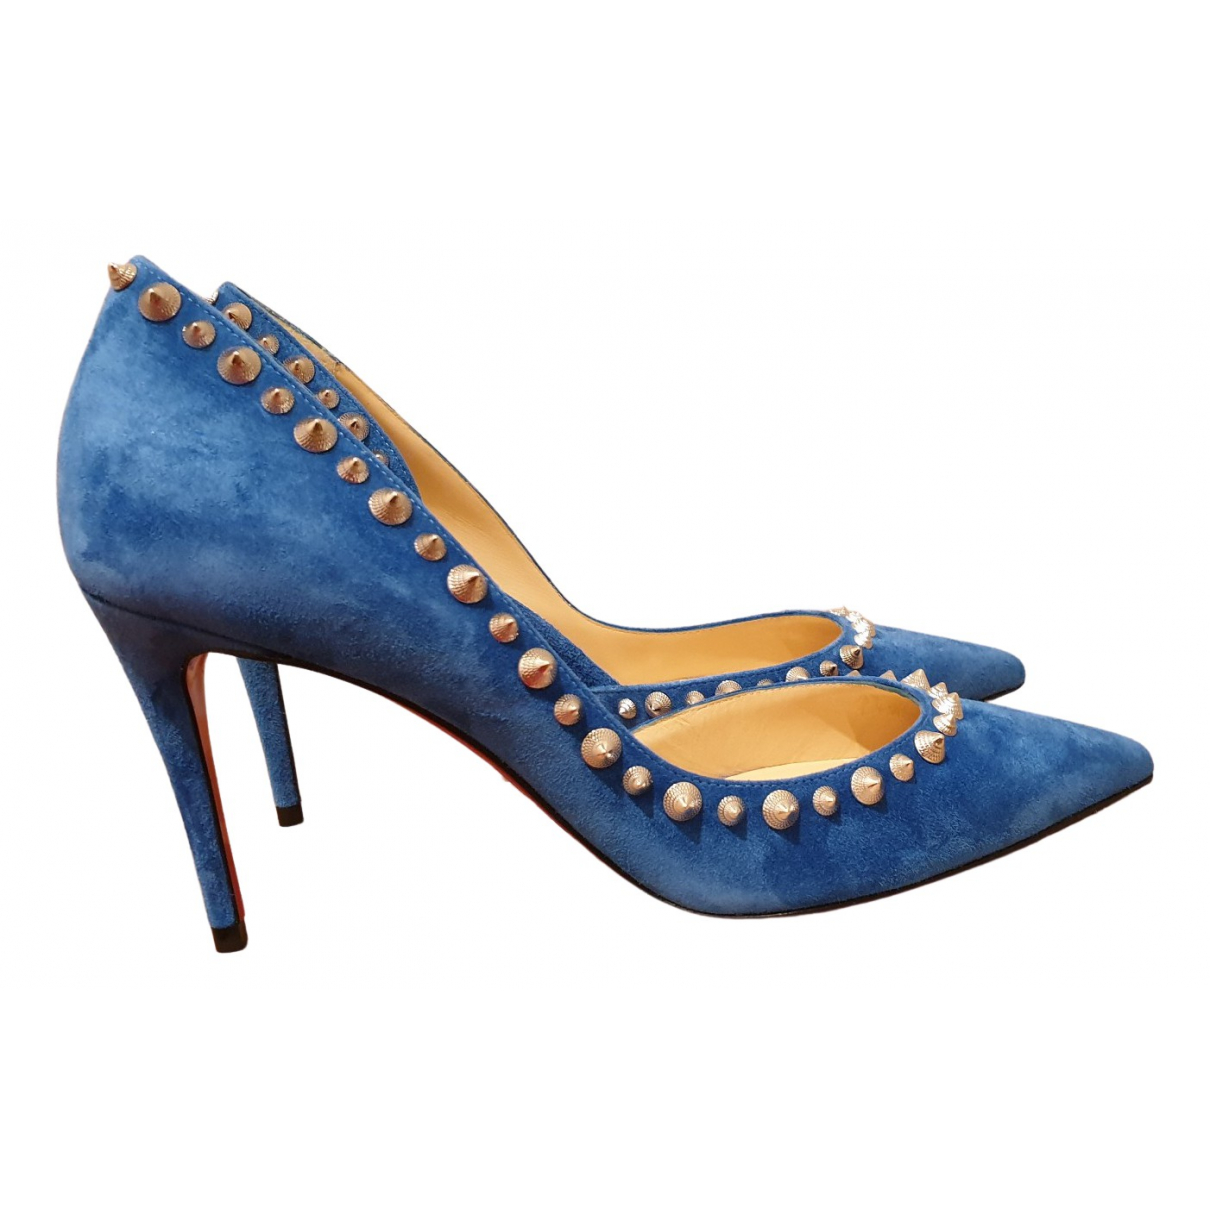 Christian Louboutin - Escarpins Iriza pour femme en suede - bleu